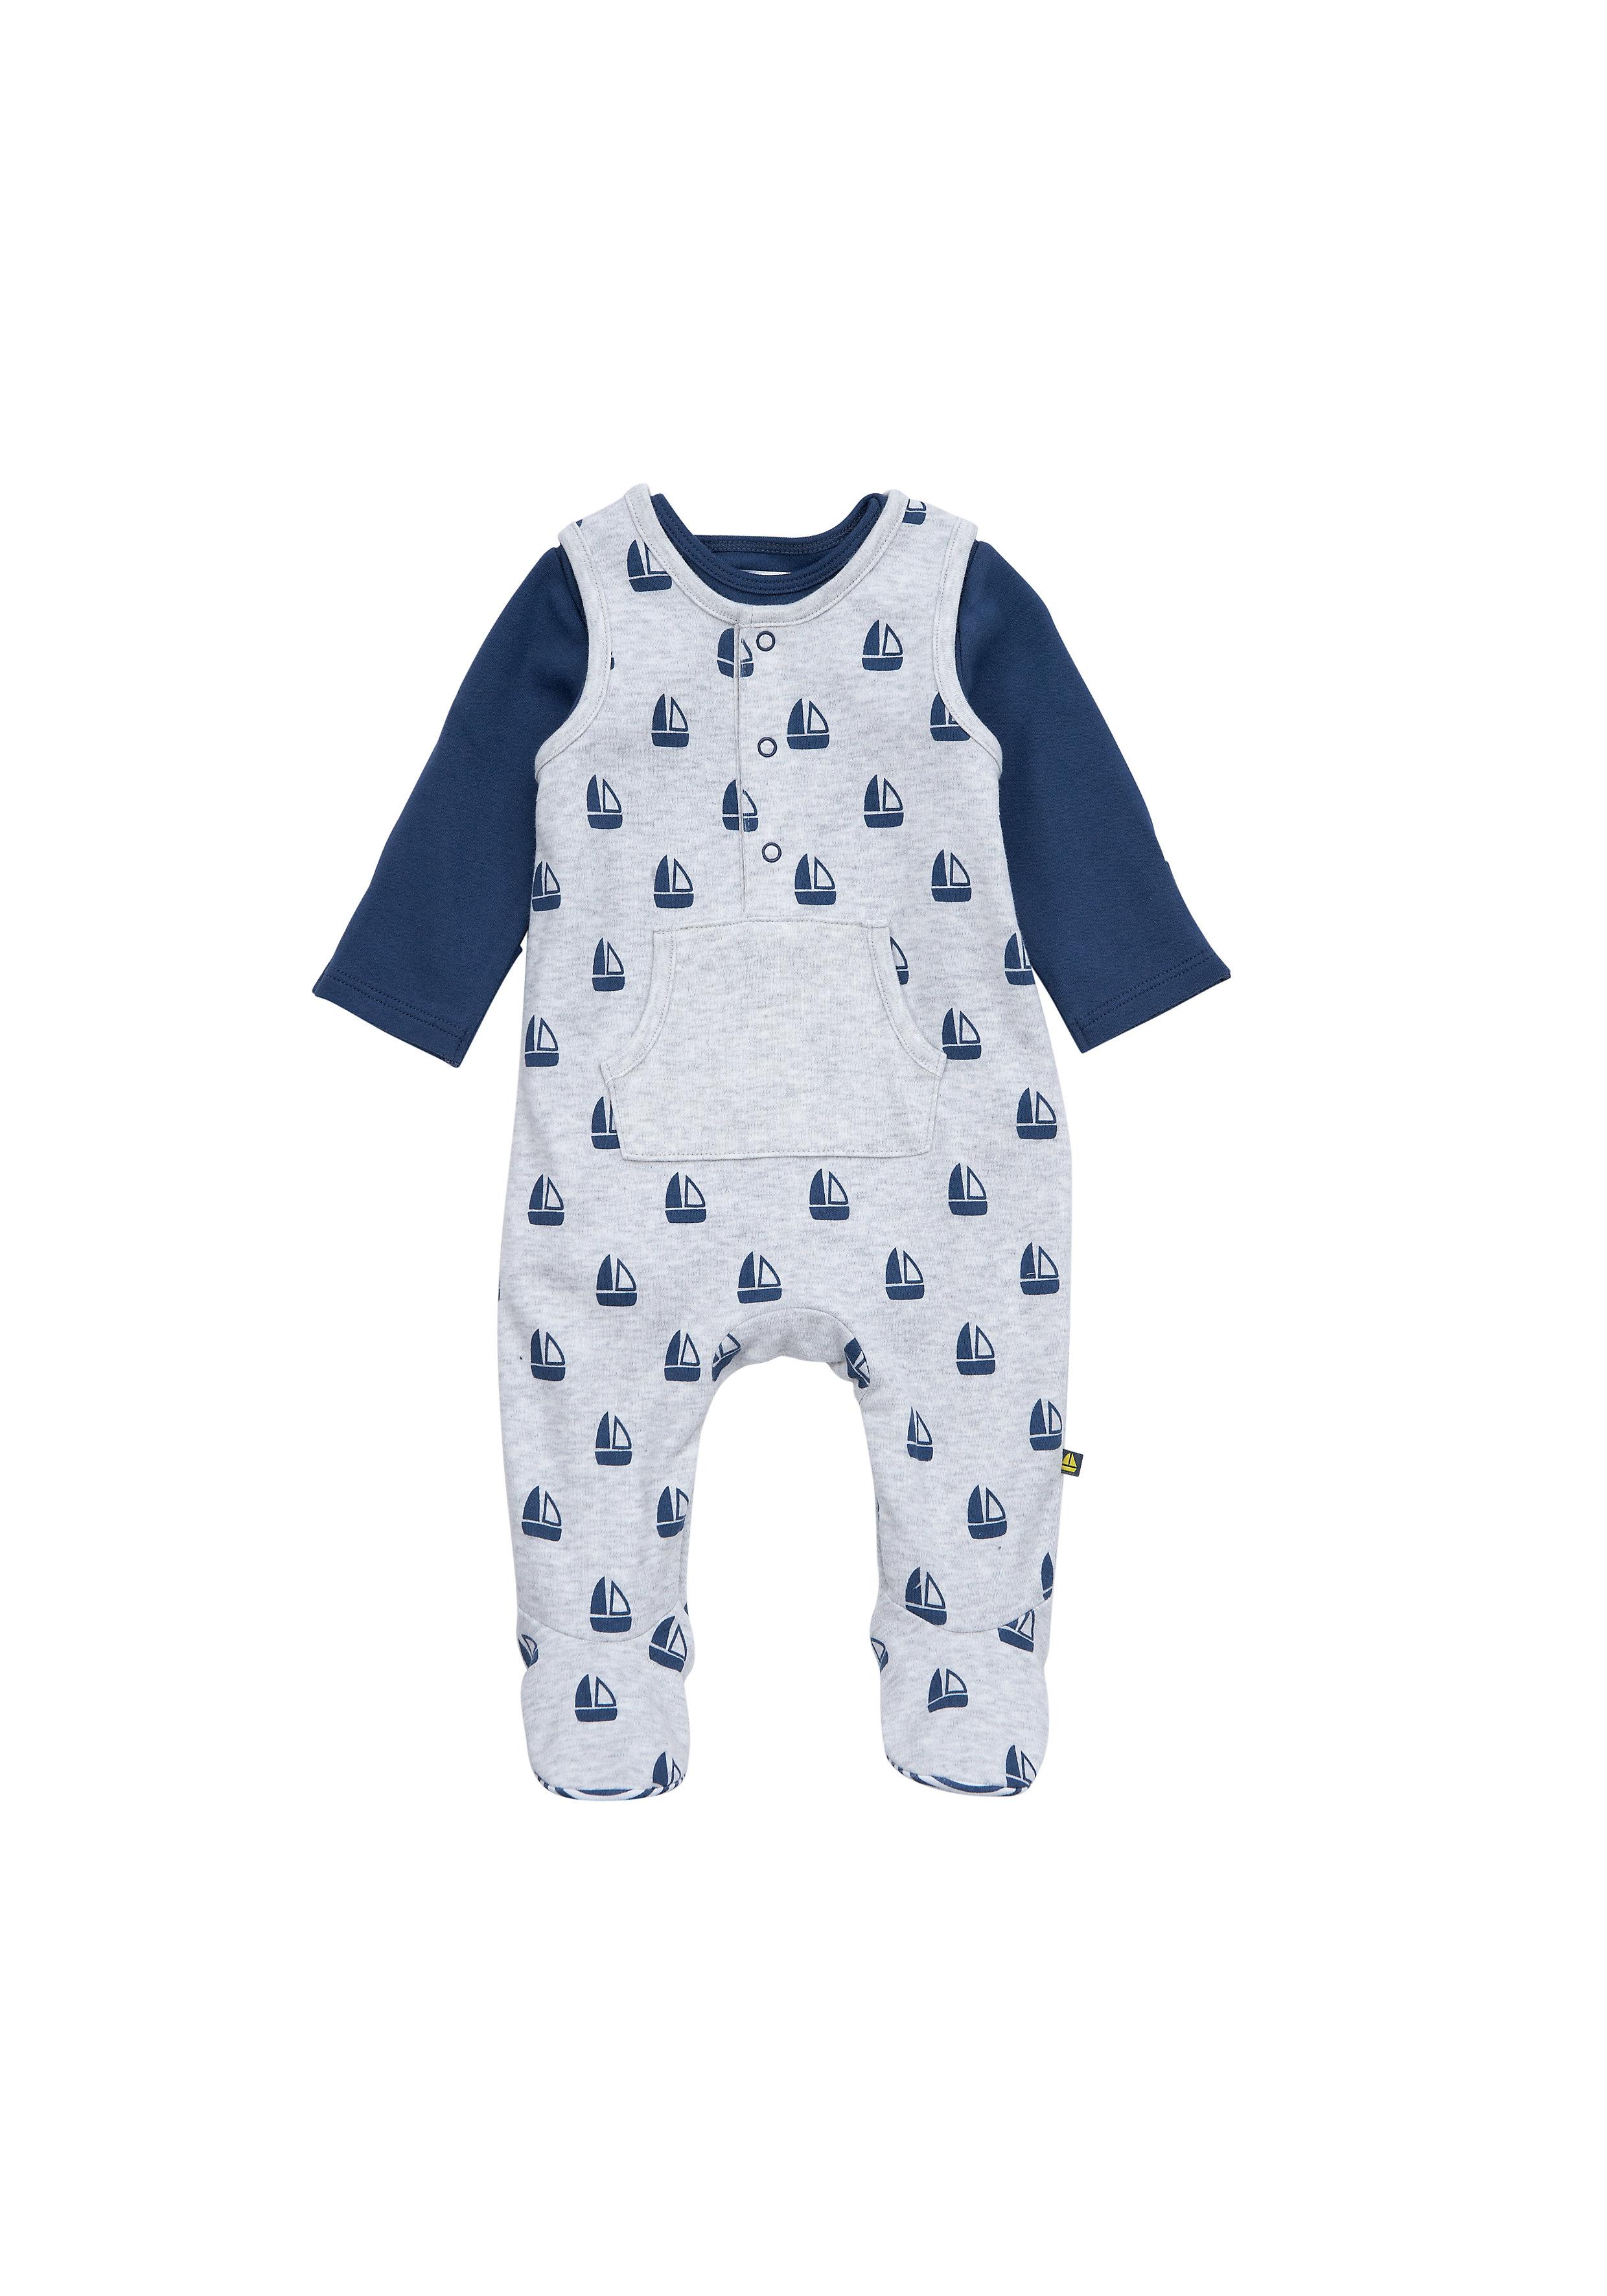 Mothercare | Boys Full Sleeves Dungaree Set Boat Print - Grey